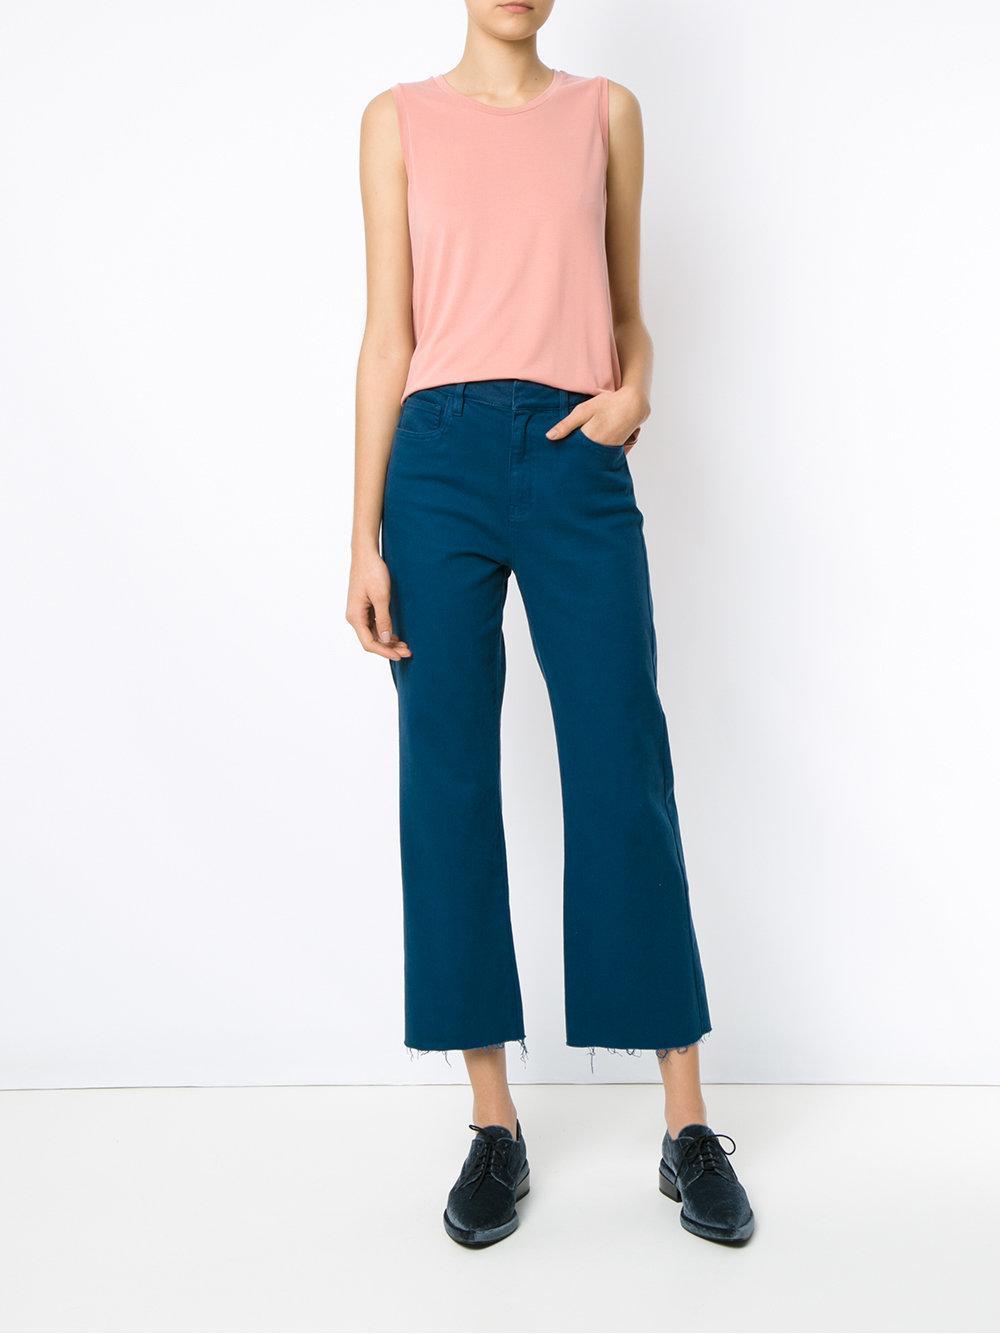 5c17d9069213 https   www.lyst.com clothing visvim-jumbo-hoodie-po-veggie-dye-1 ...